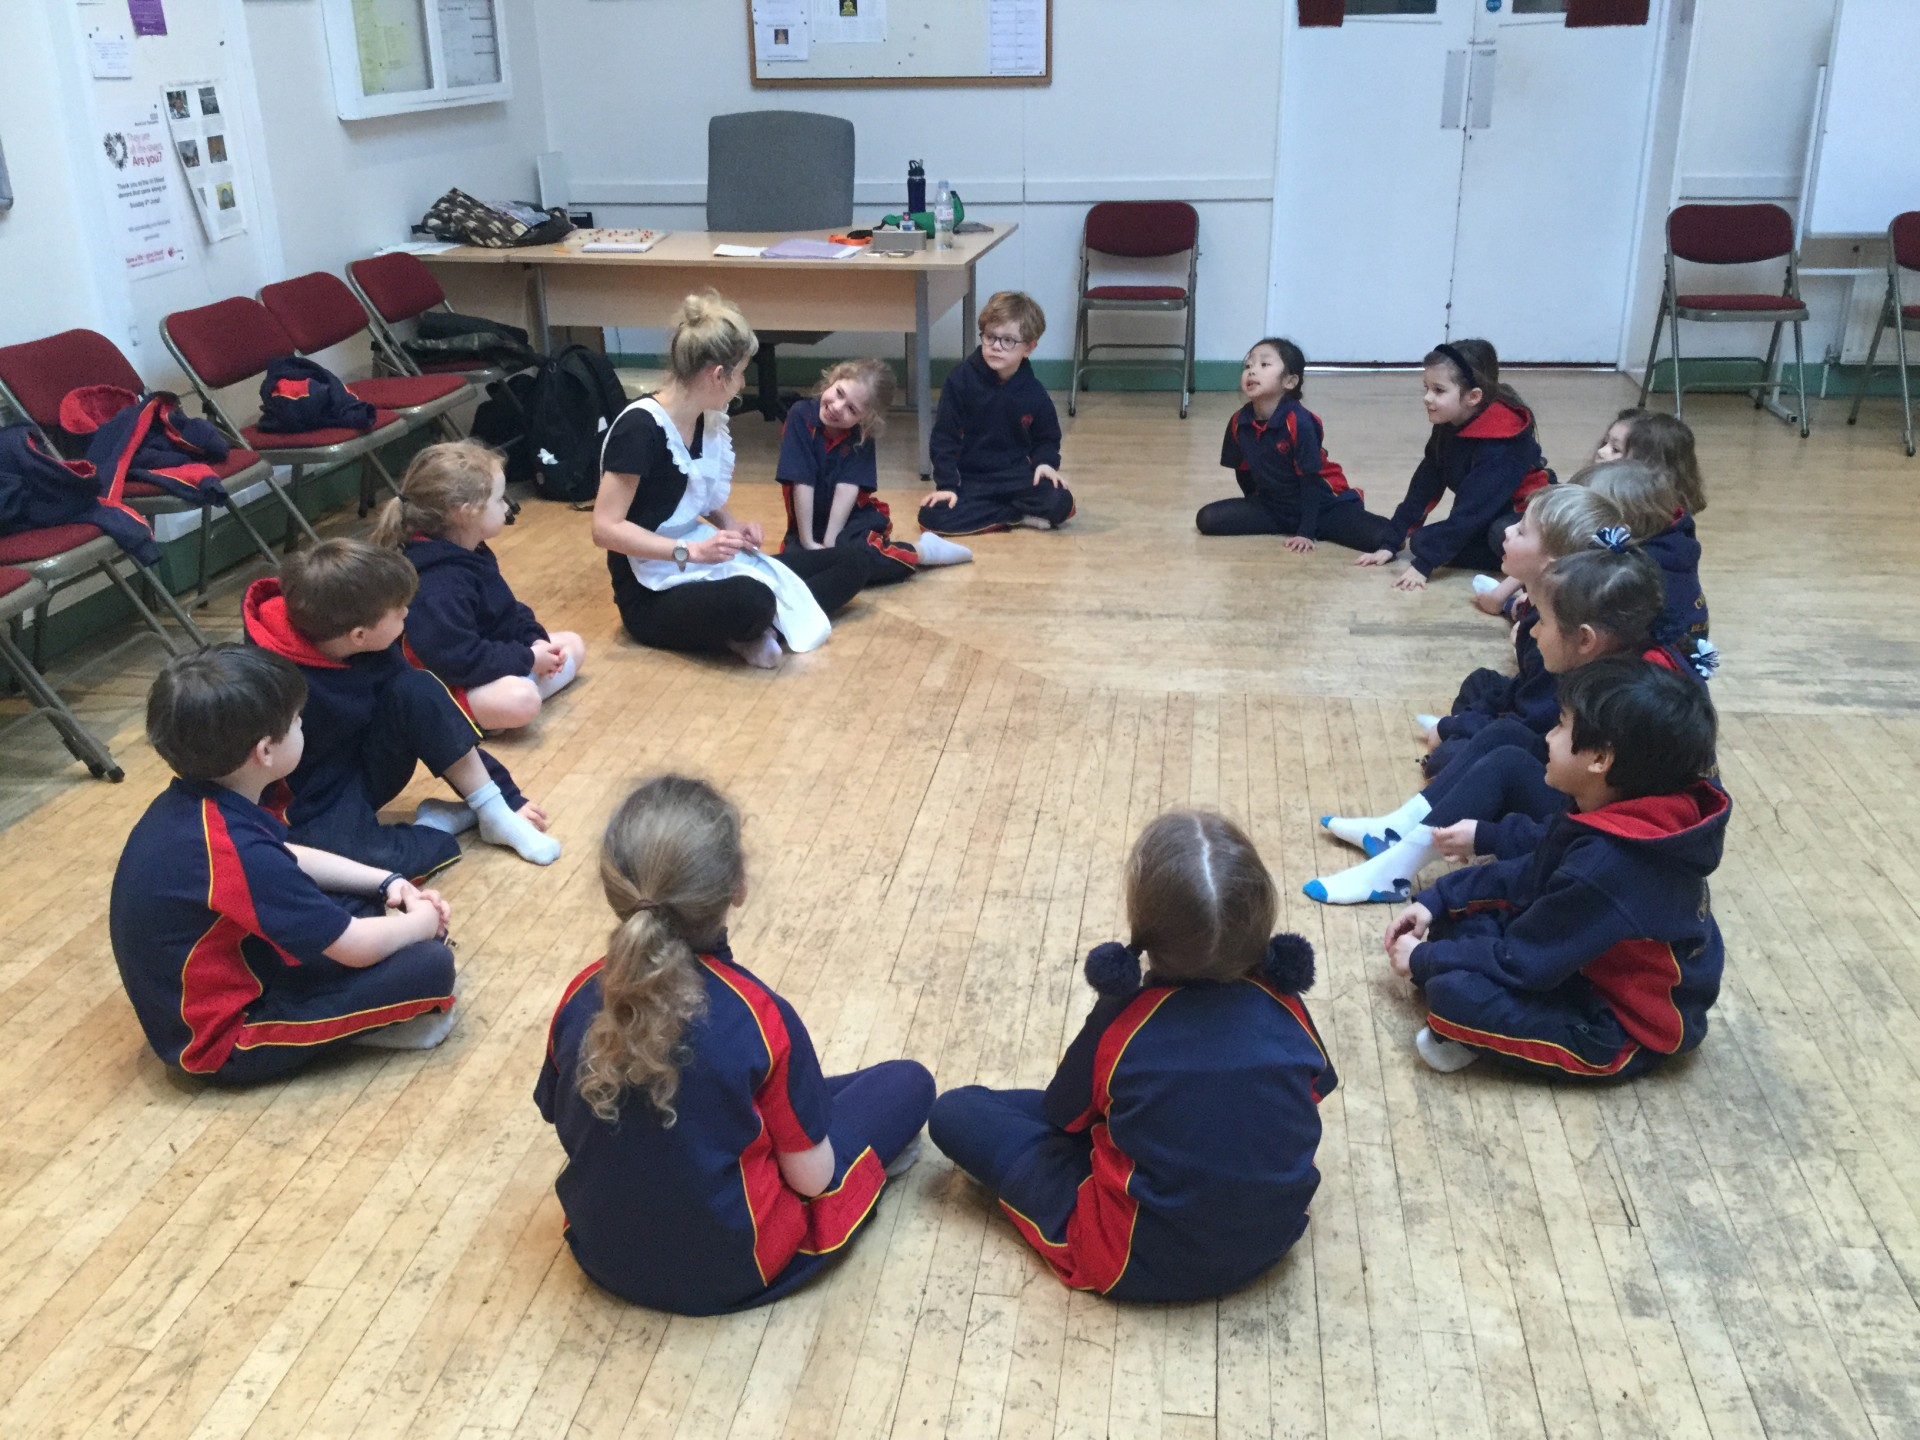 1H Drama Workshop